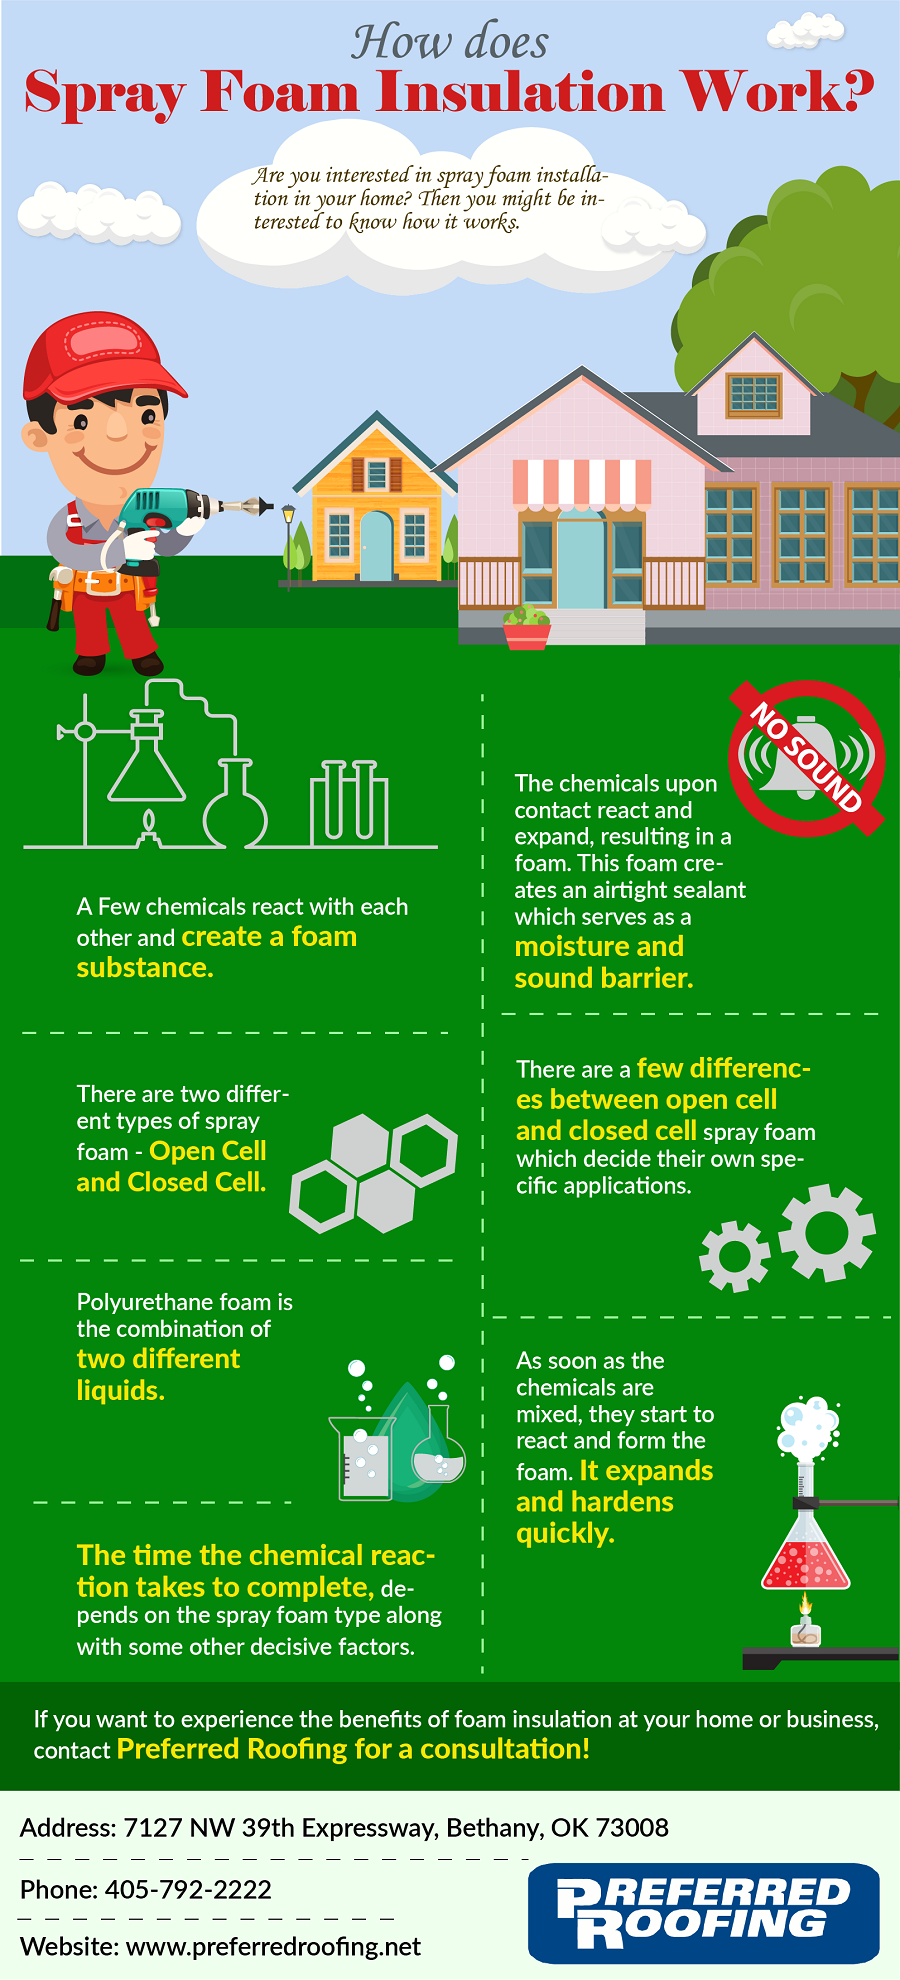 How Does Spray Foam Insulation Work